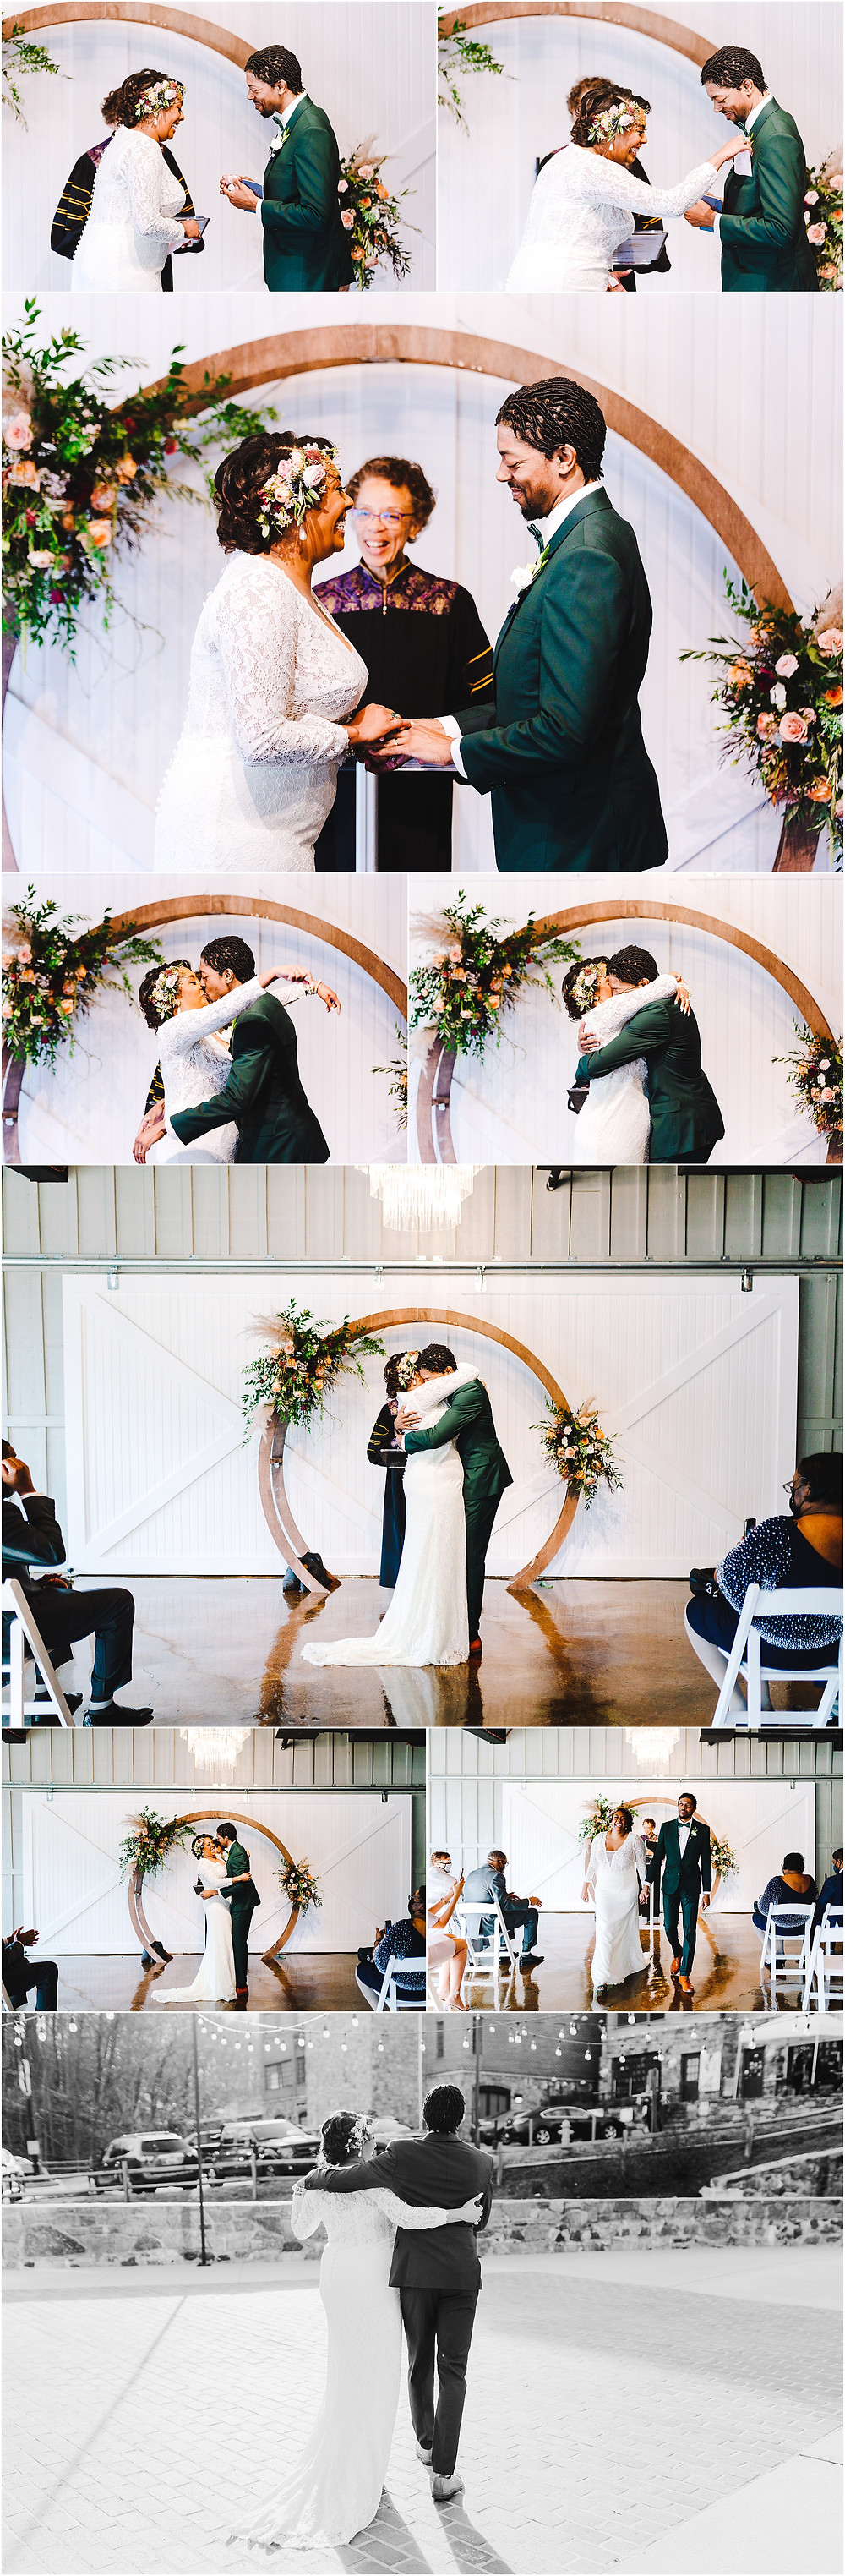 Main Street Baltimore Wedding Ceremony. Baltimore Wedding Photographer